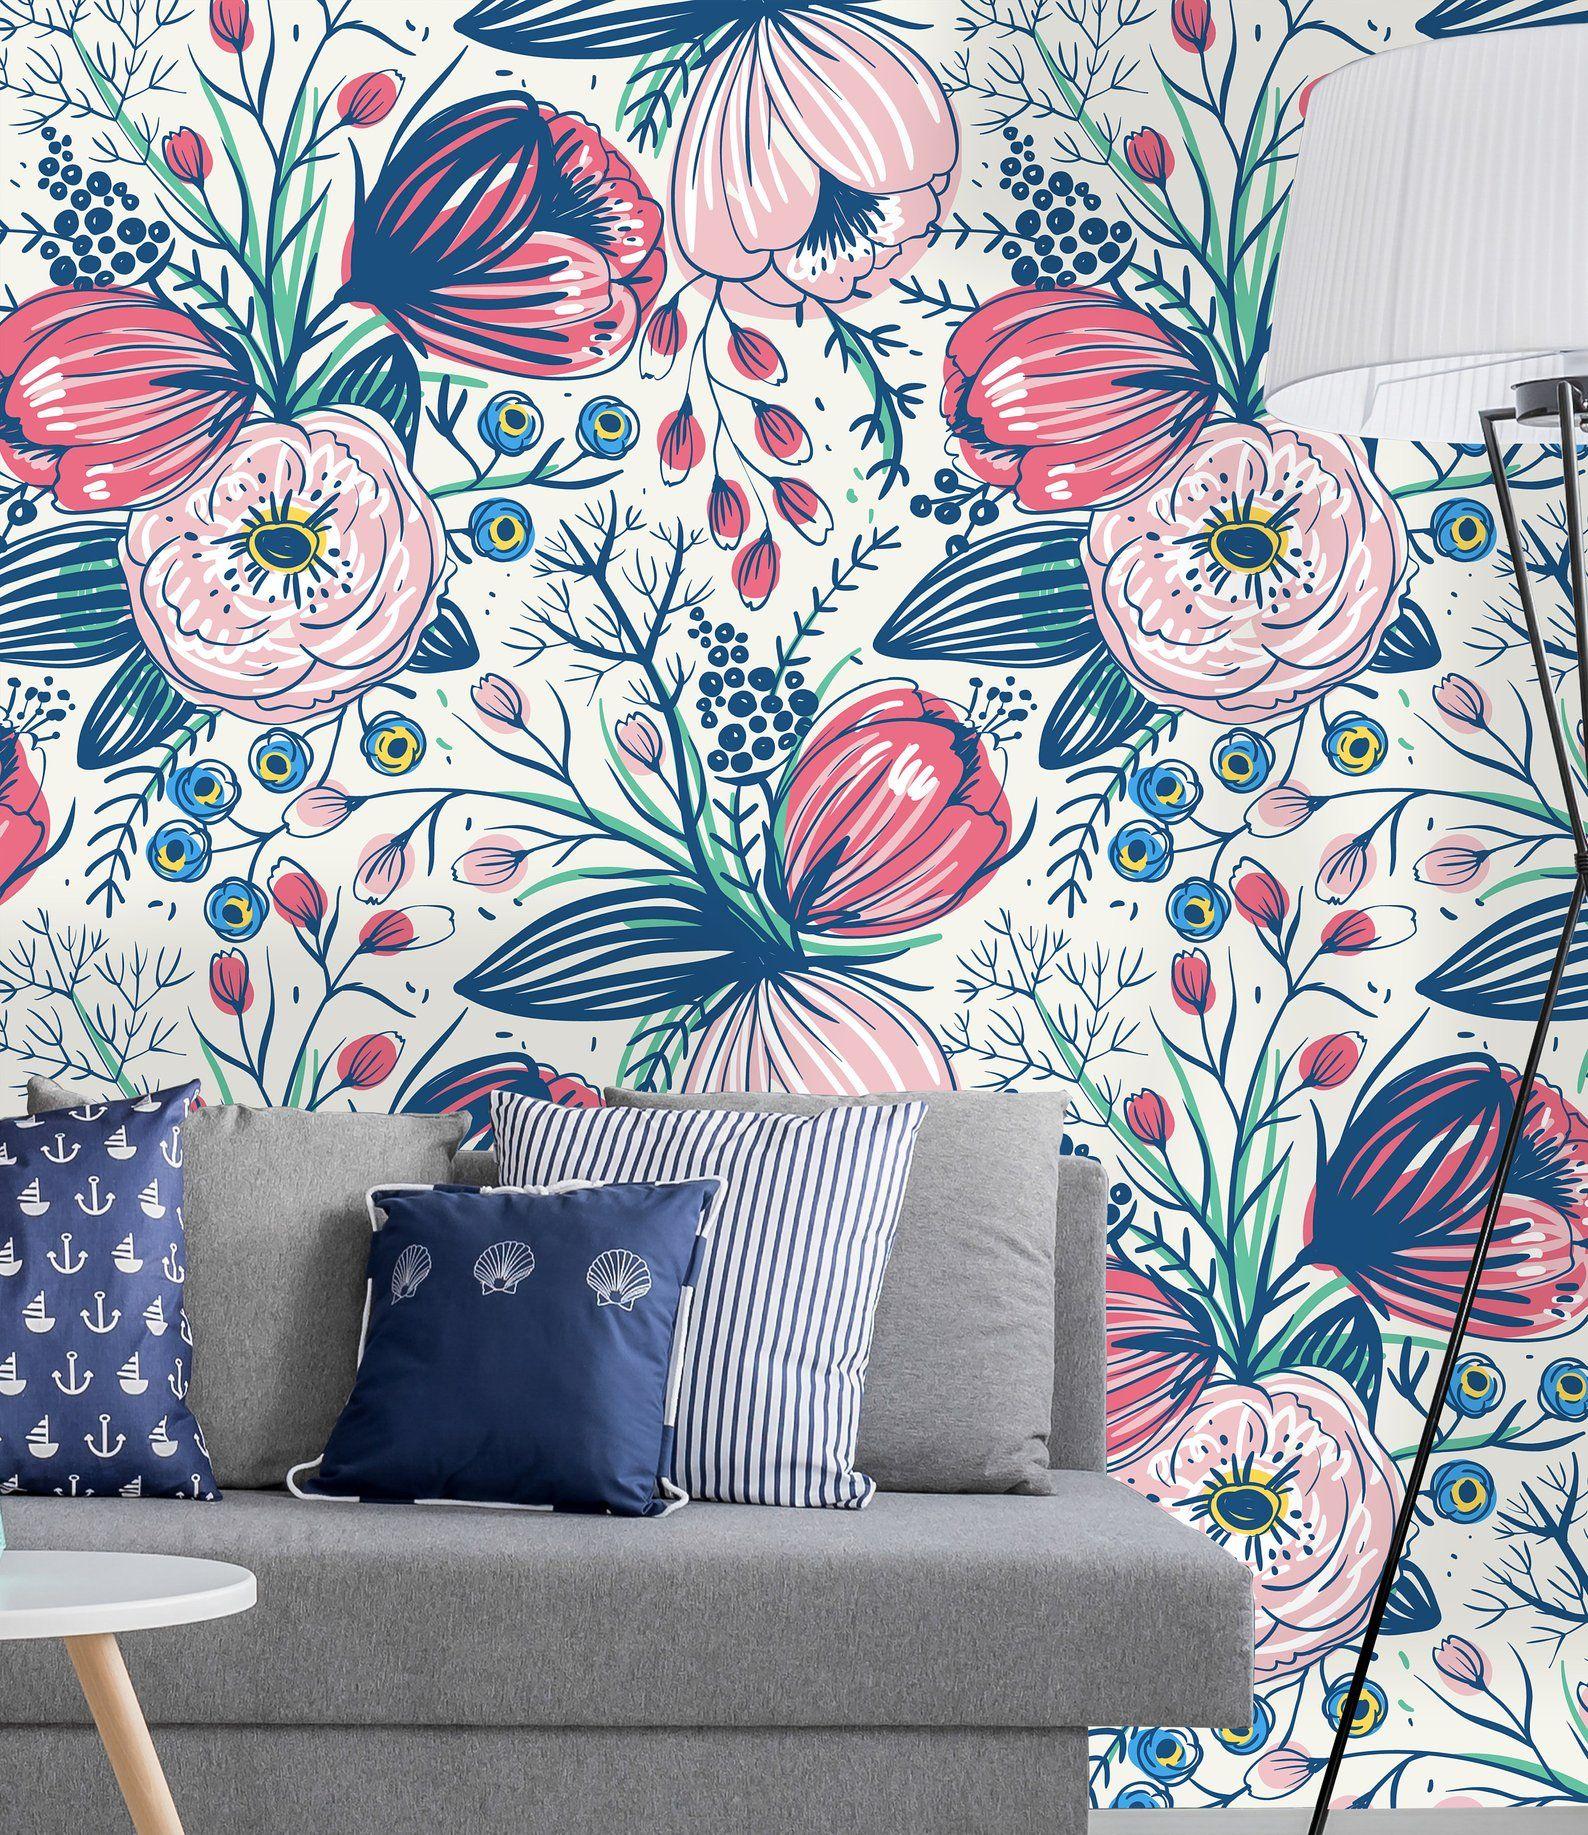 Fond Decran Amovible Auto Adhesif Wallpaper Peler Et Coller Etsy Wallpaper Roll Decor Mural Wallpaper